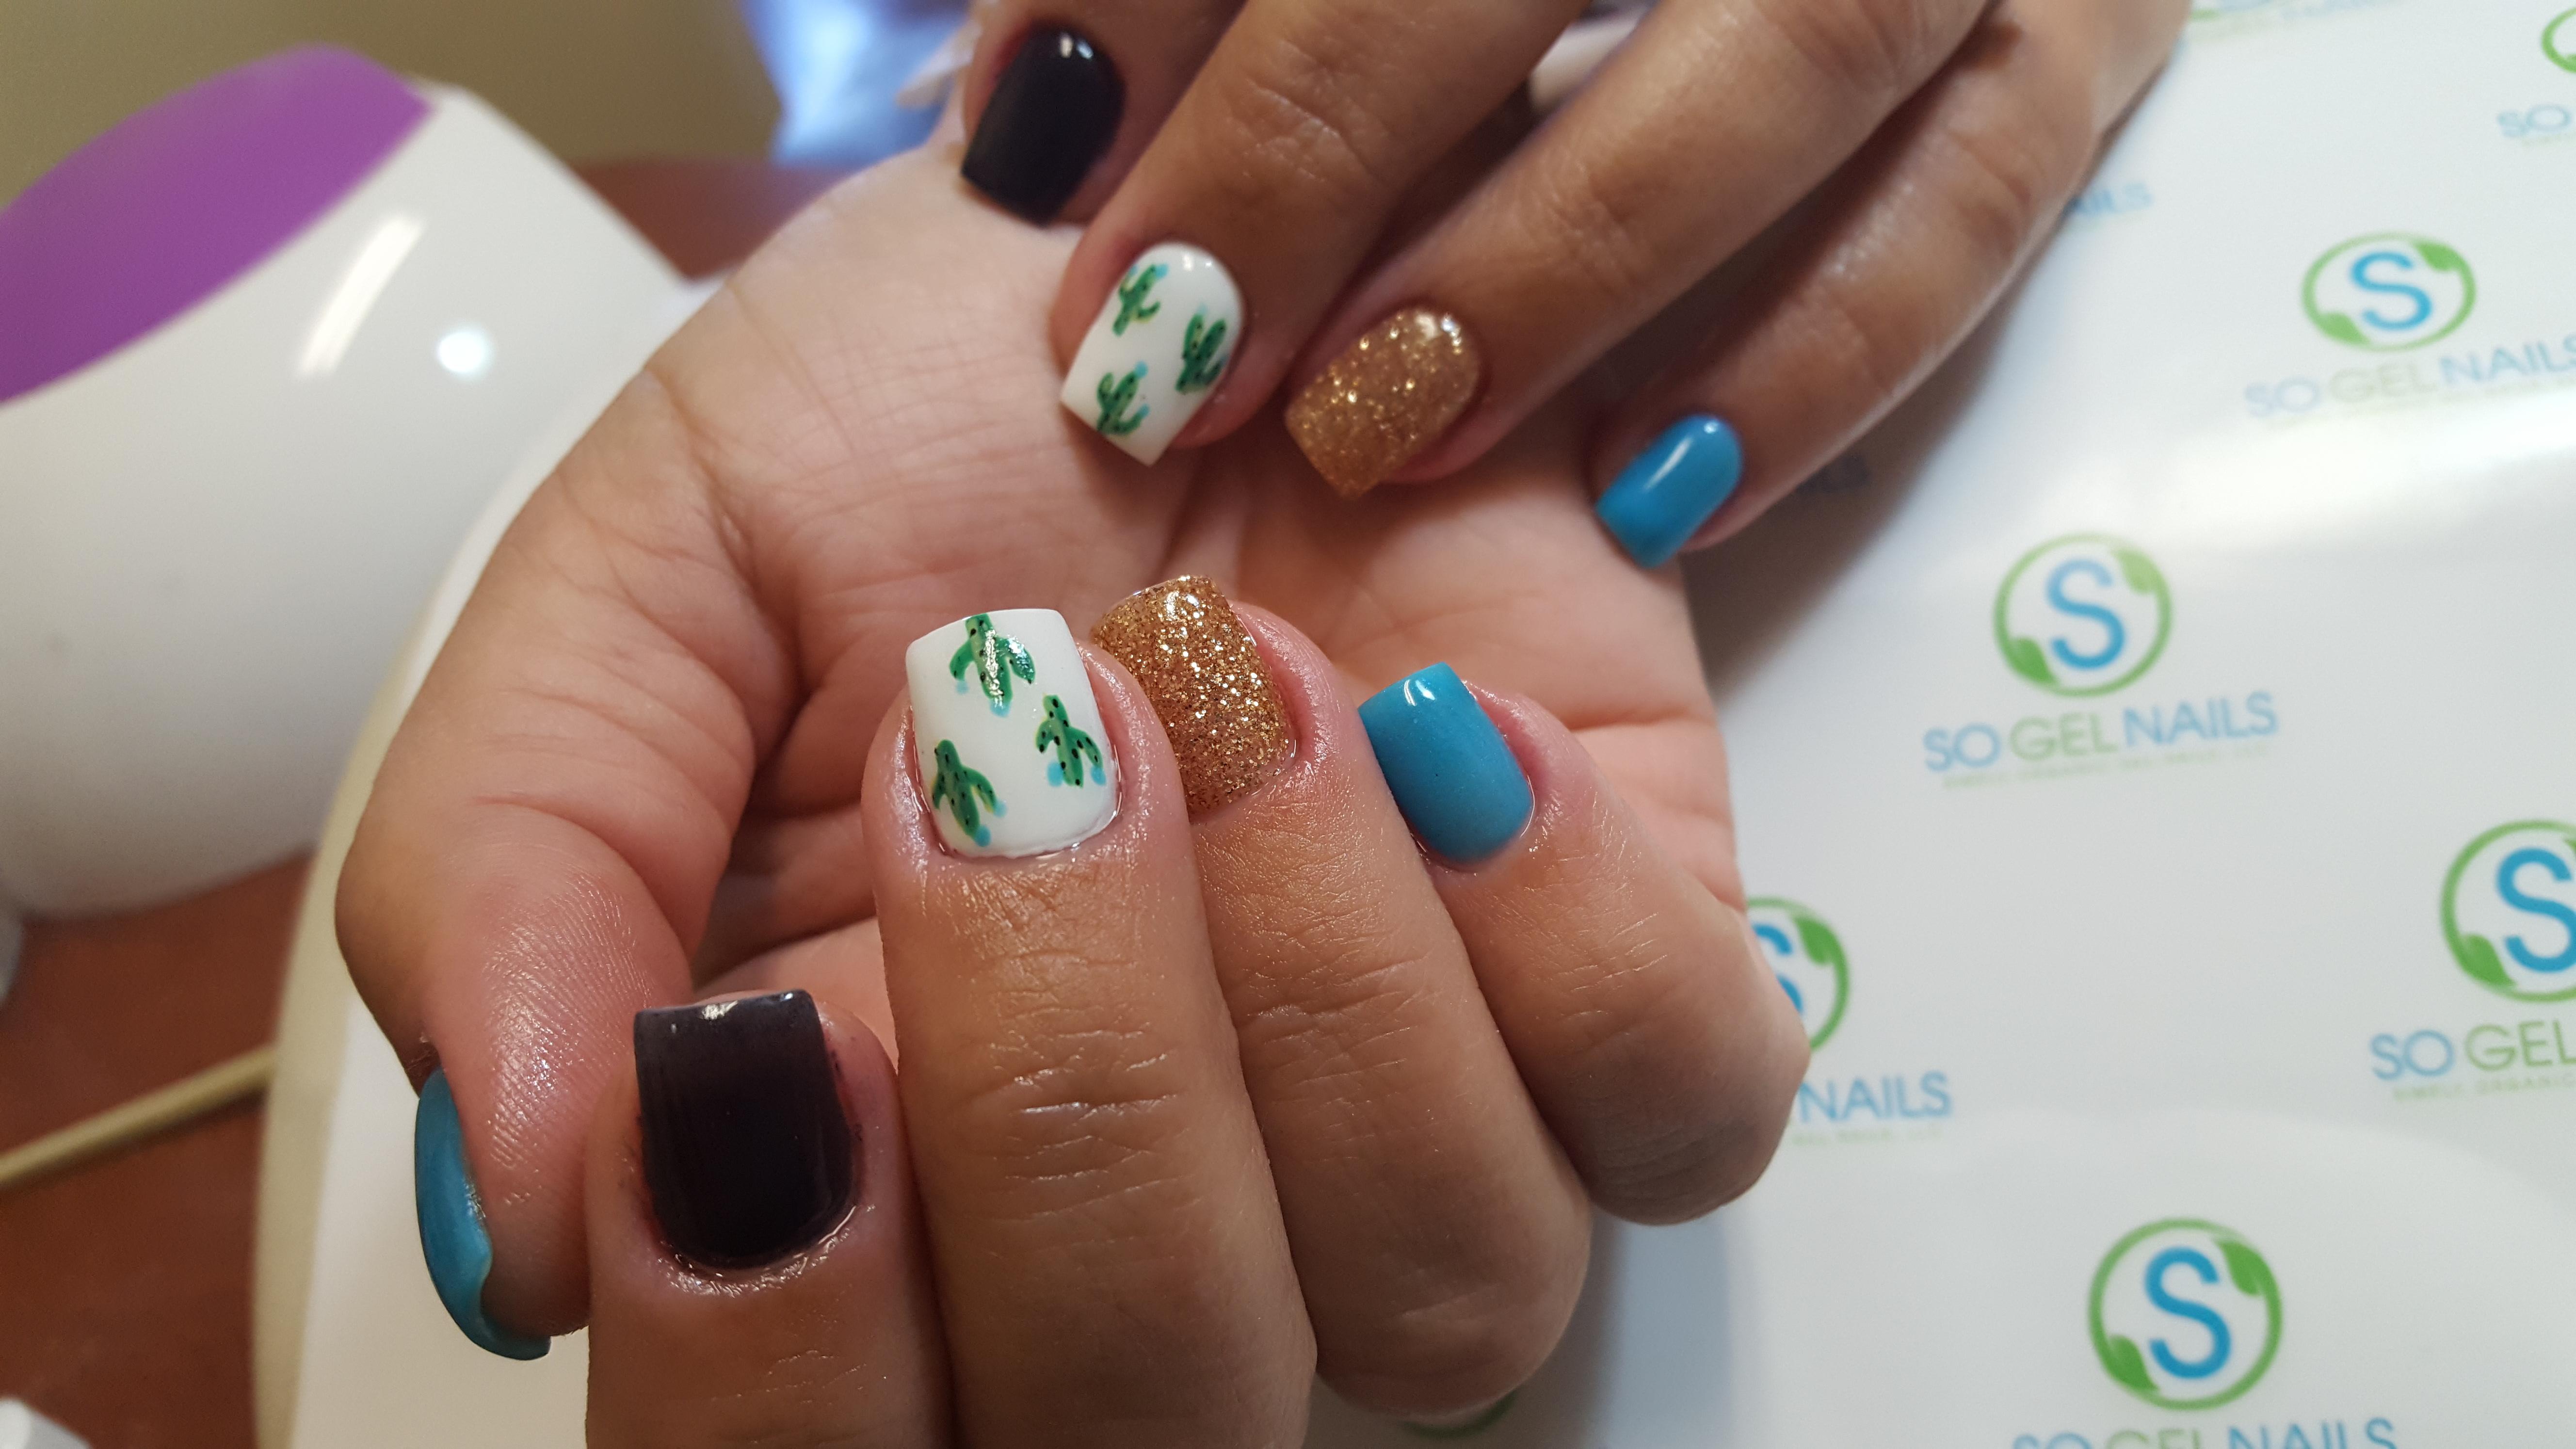 Day 113: Little Cactus Nail Art